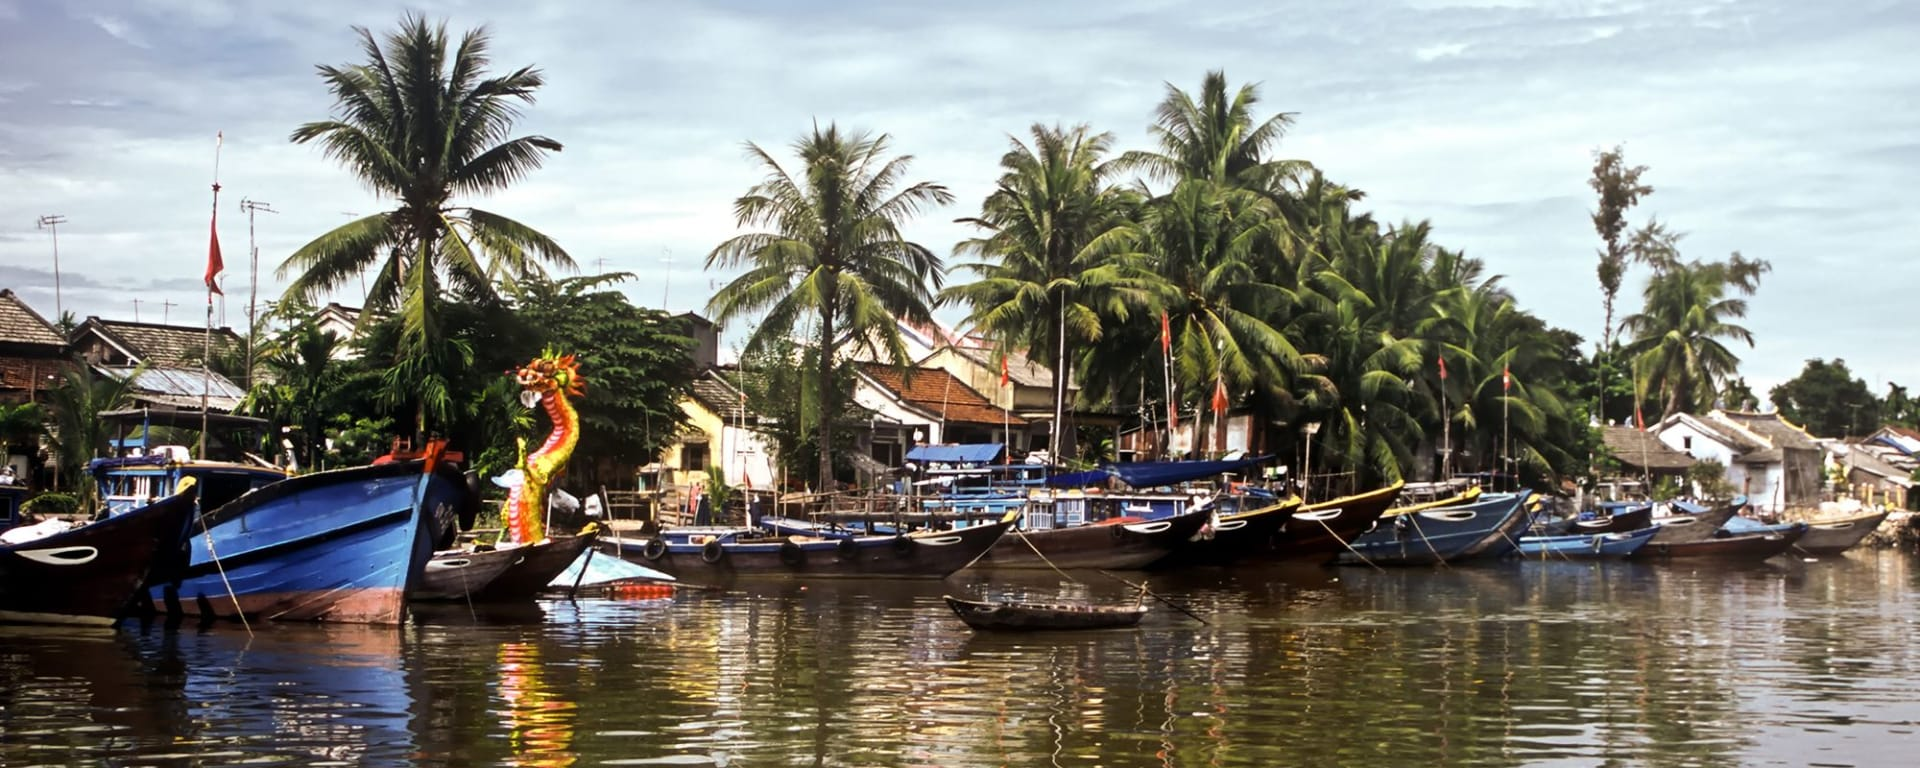 Le delta du Mékong - de/à Saigon: Mekong Delta: